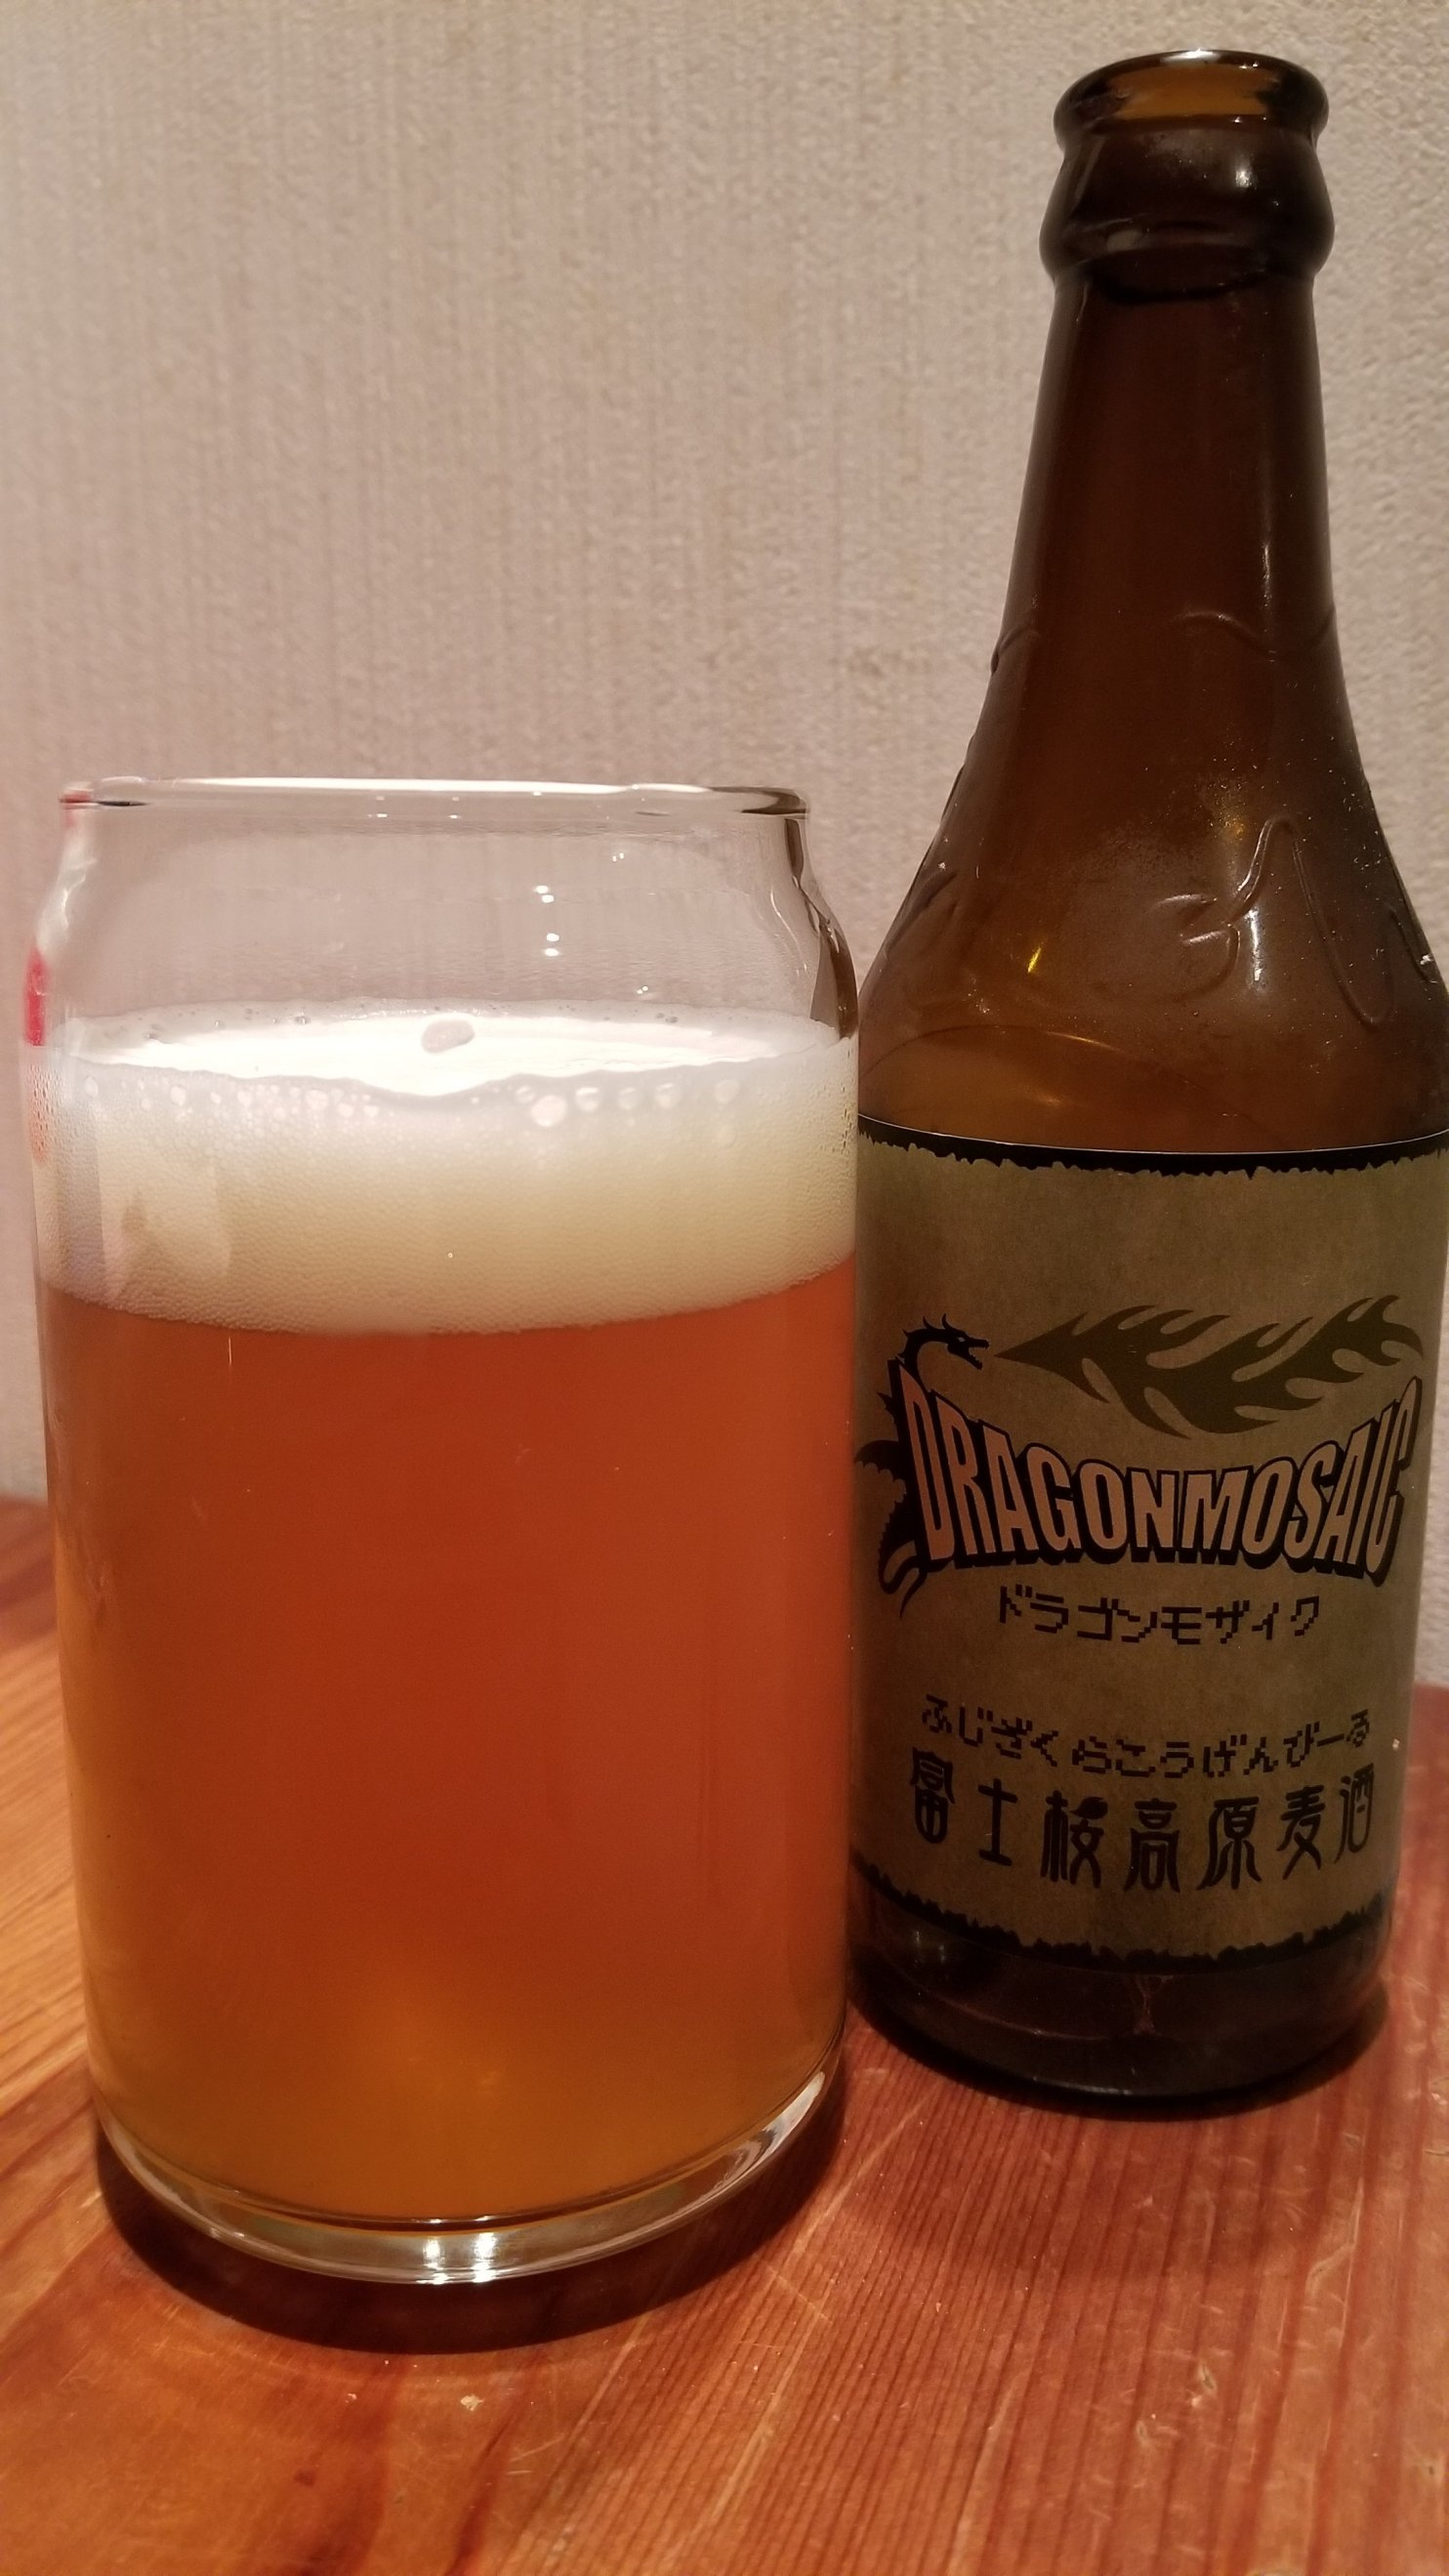 Fujizakura Dragonmosaic 富士桜ドラゴンモザイク